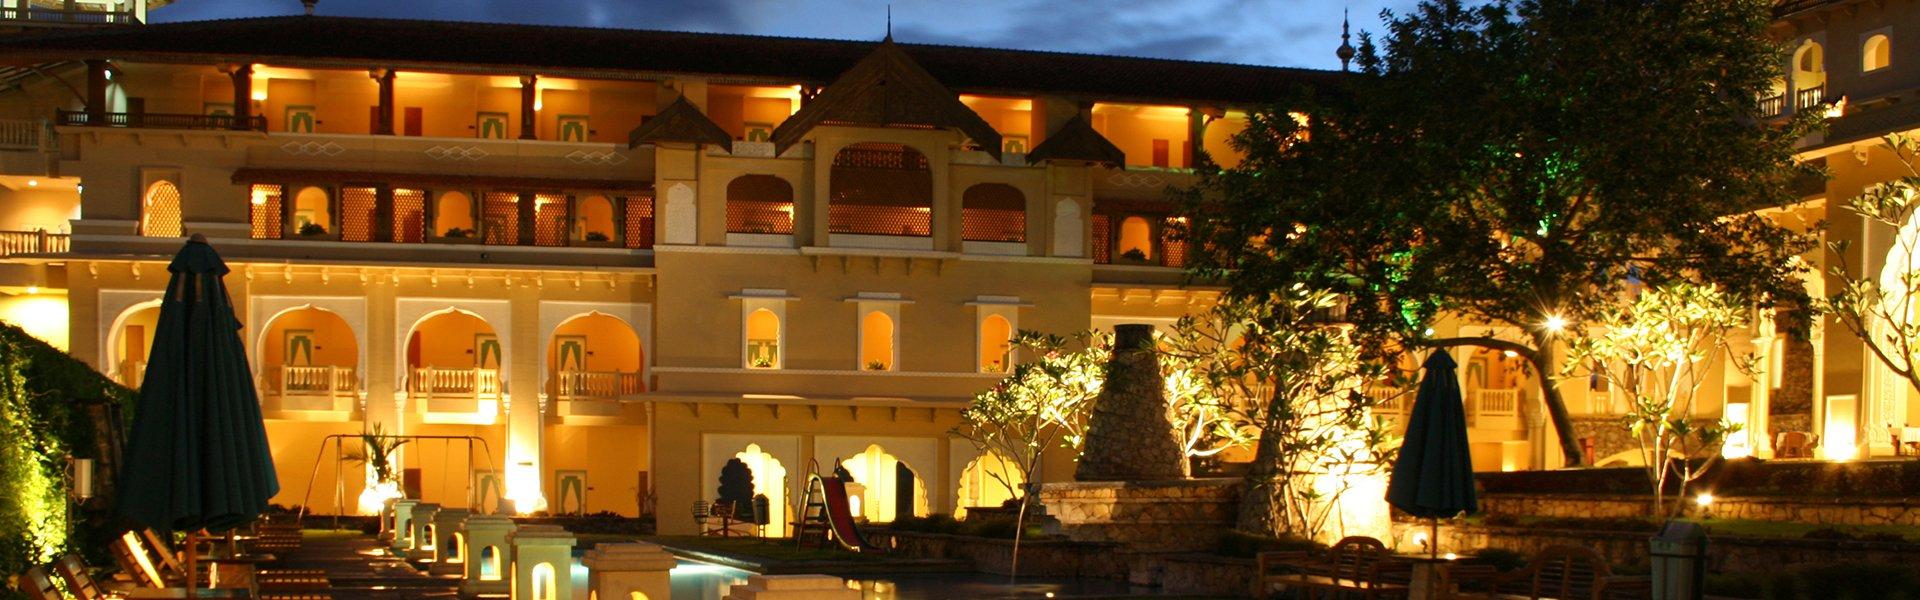 SUM - Hills hotel